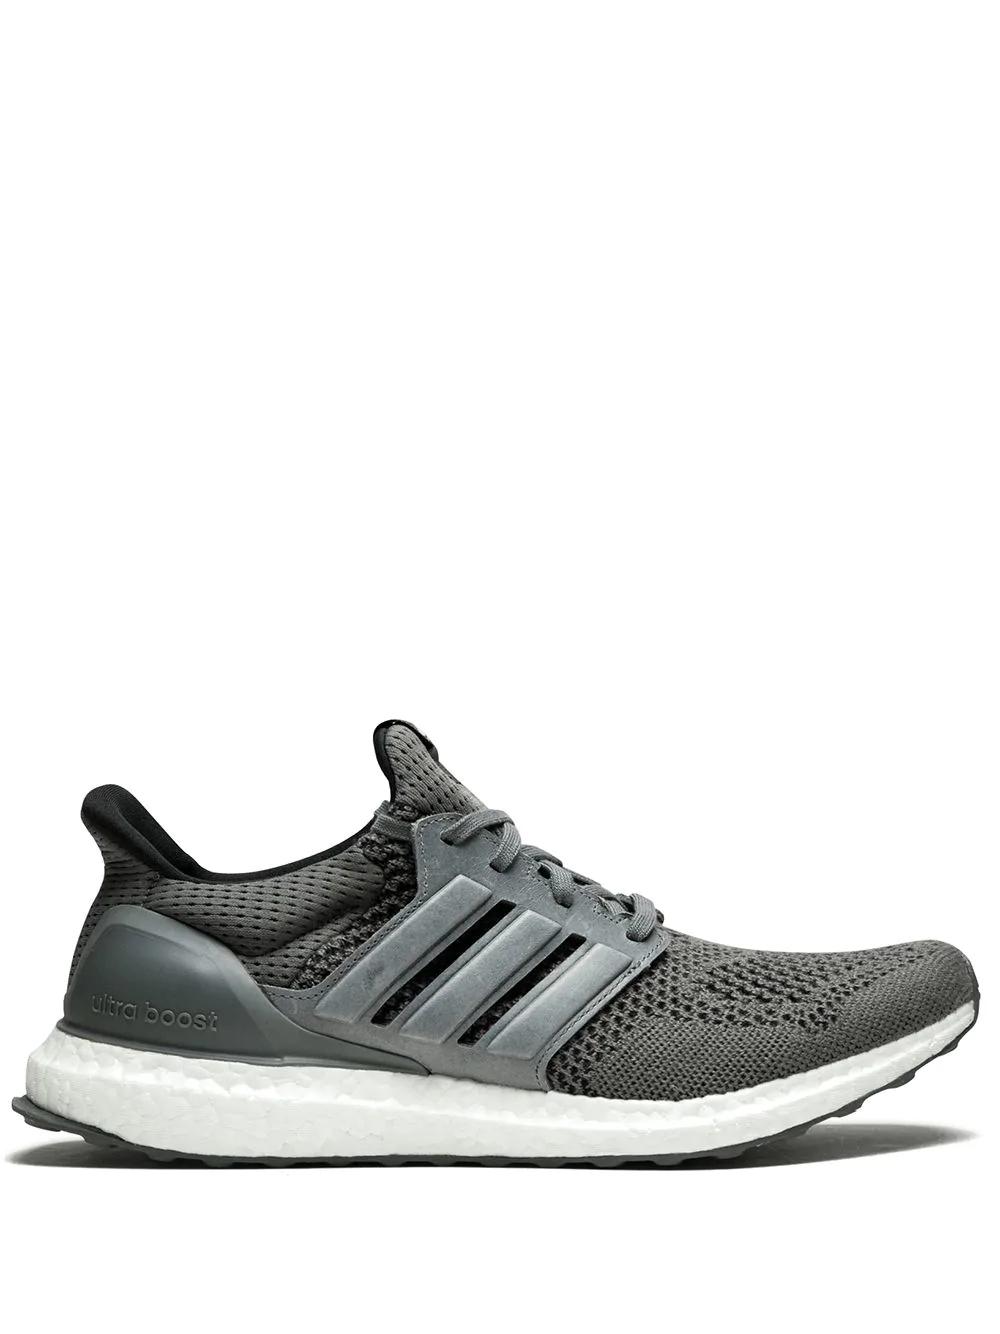 516501118 adidas yeezy ultra boost grey